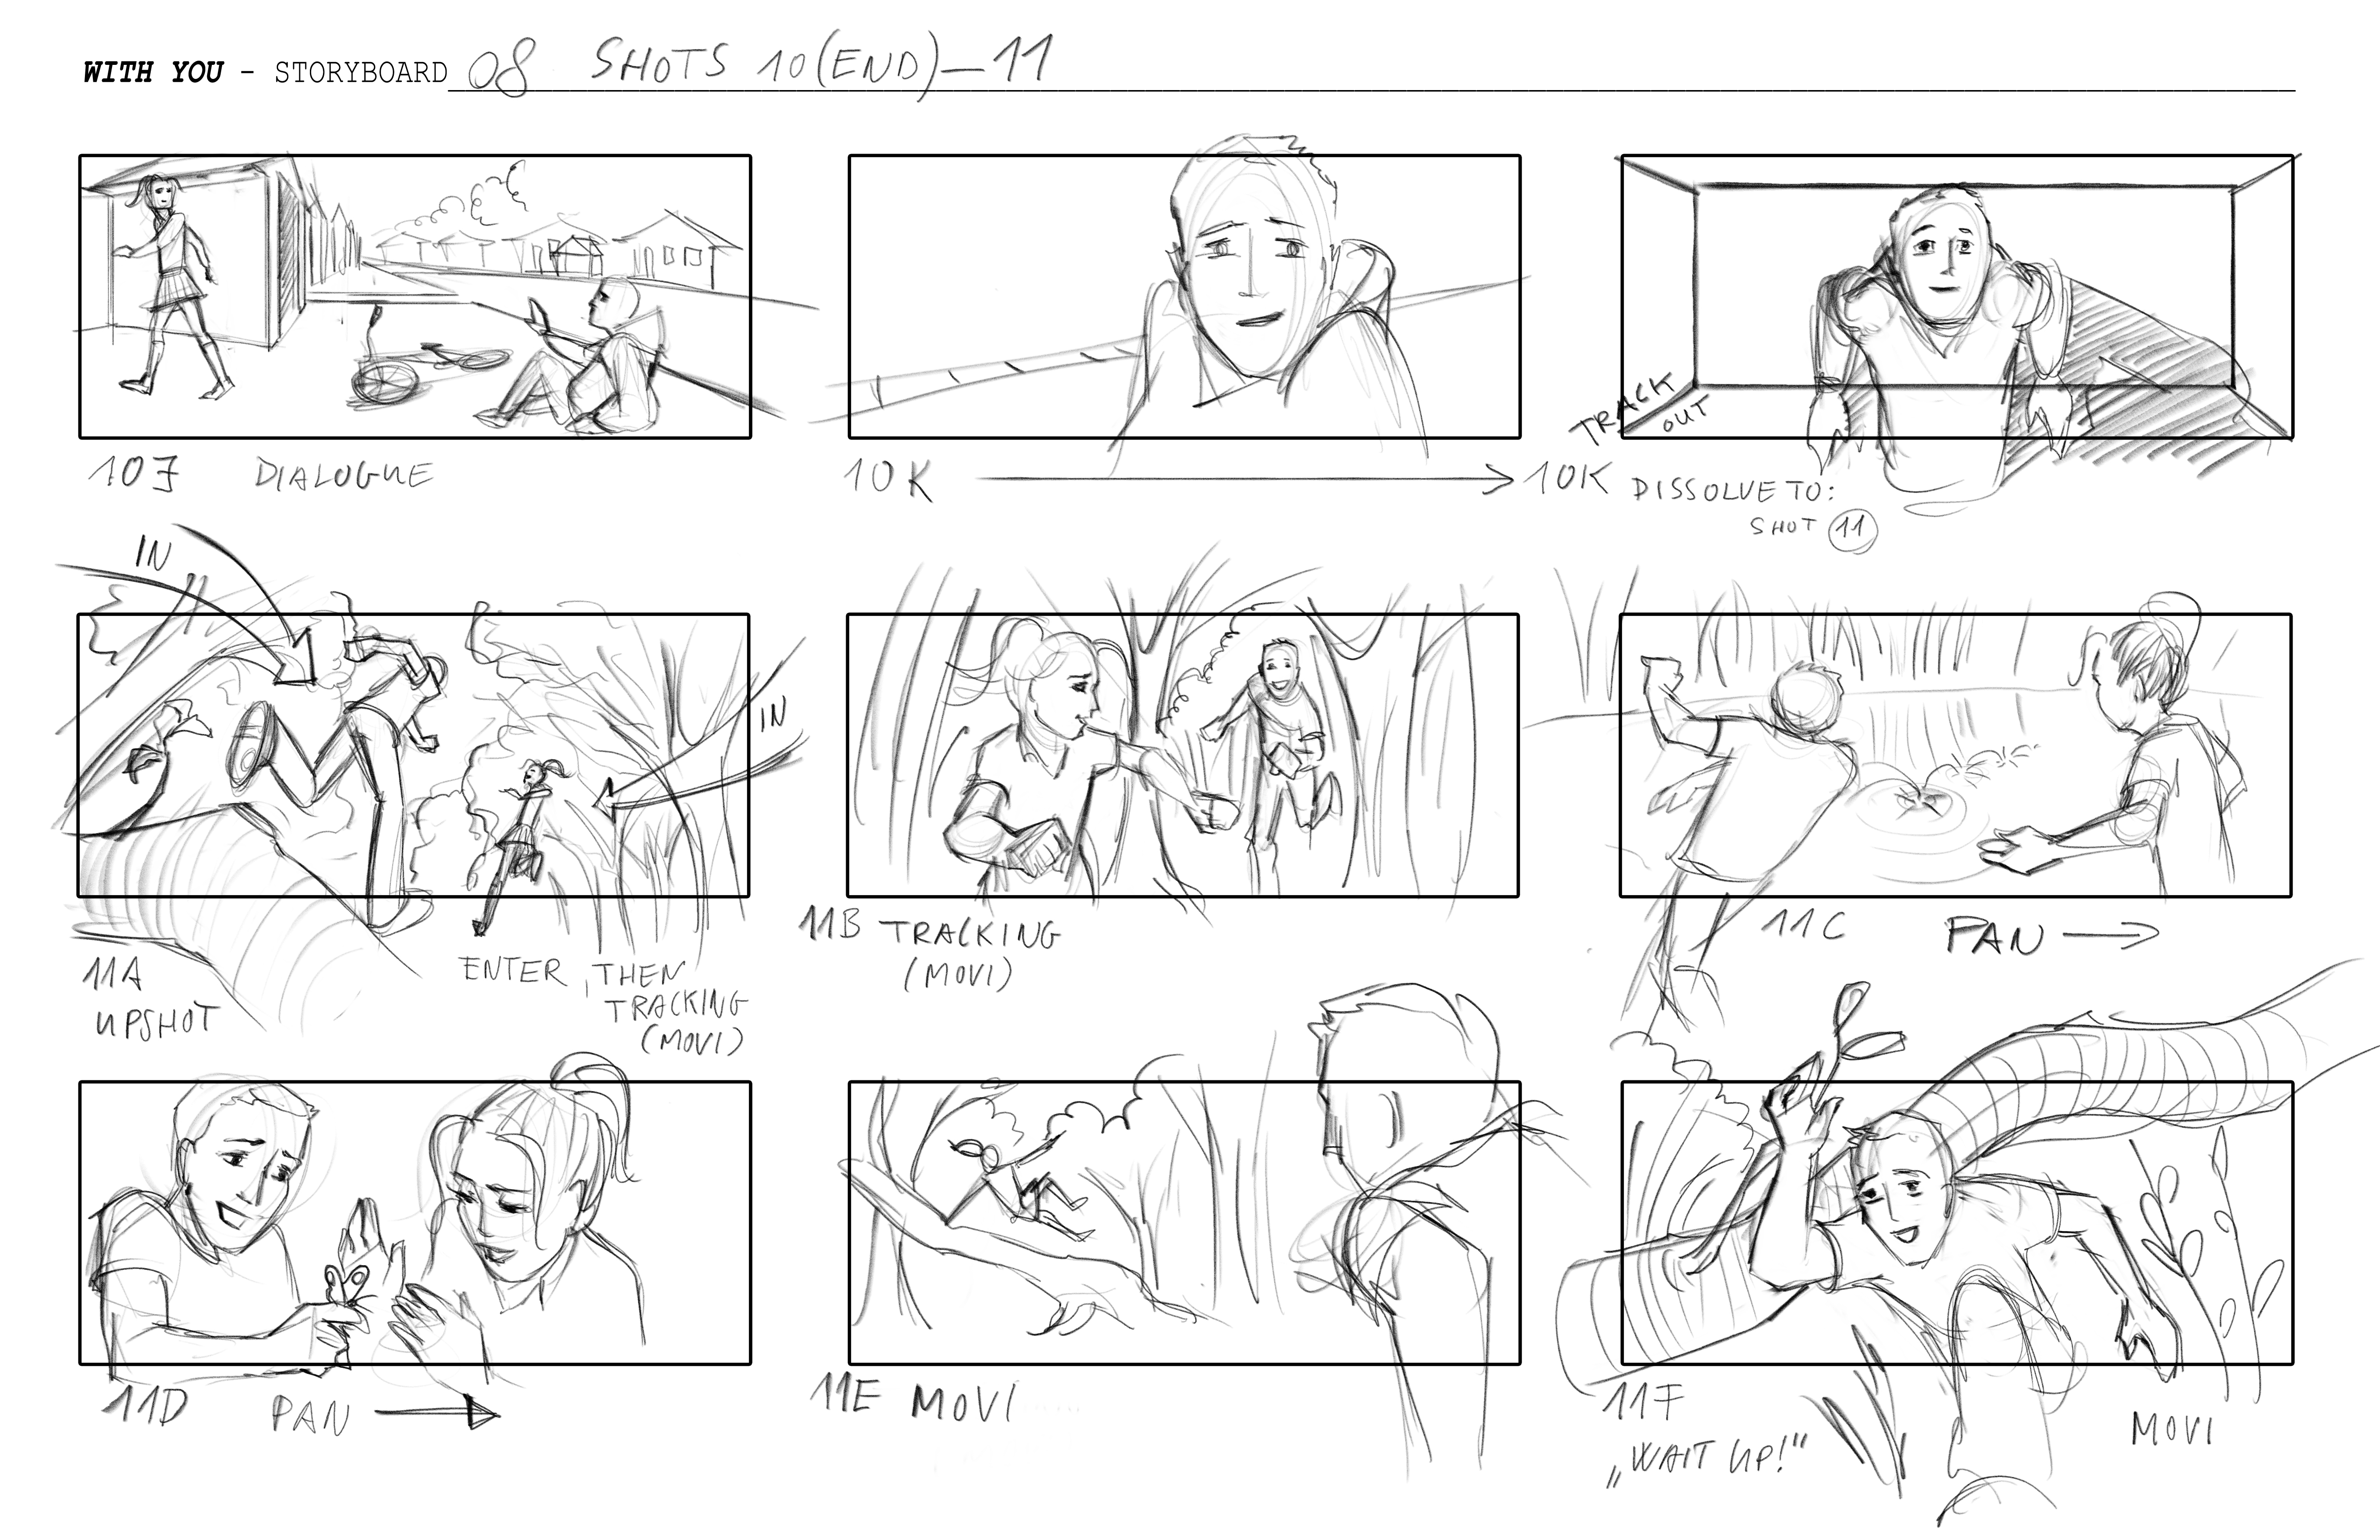 storyboard sheet 08